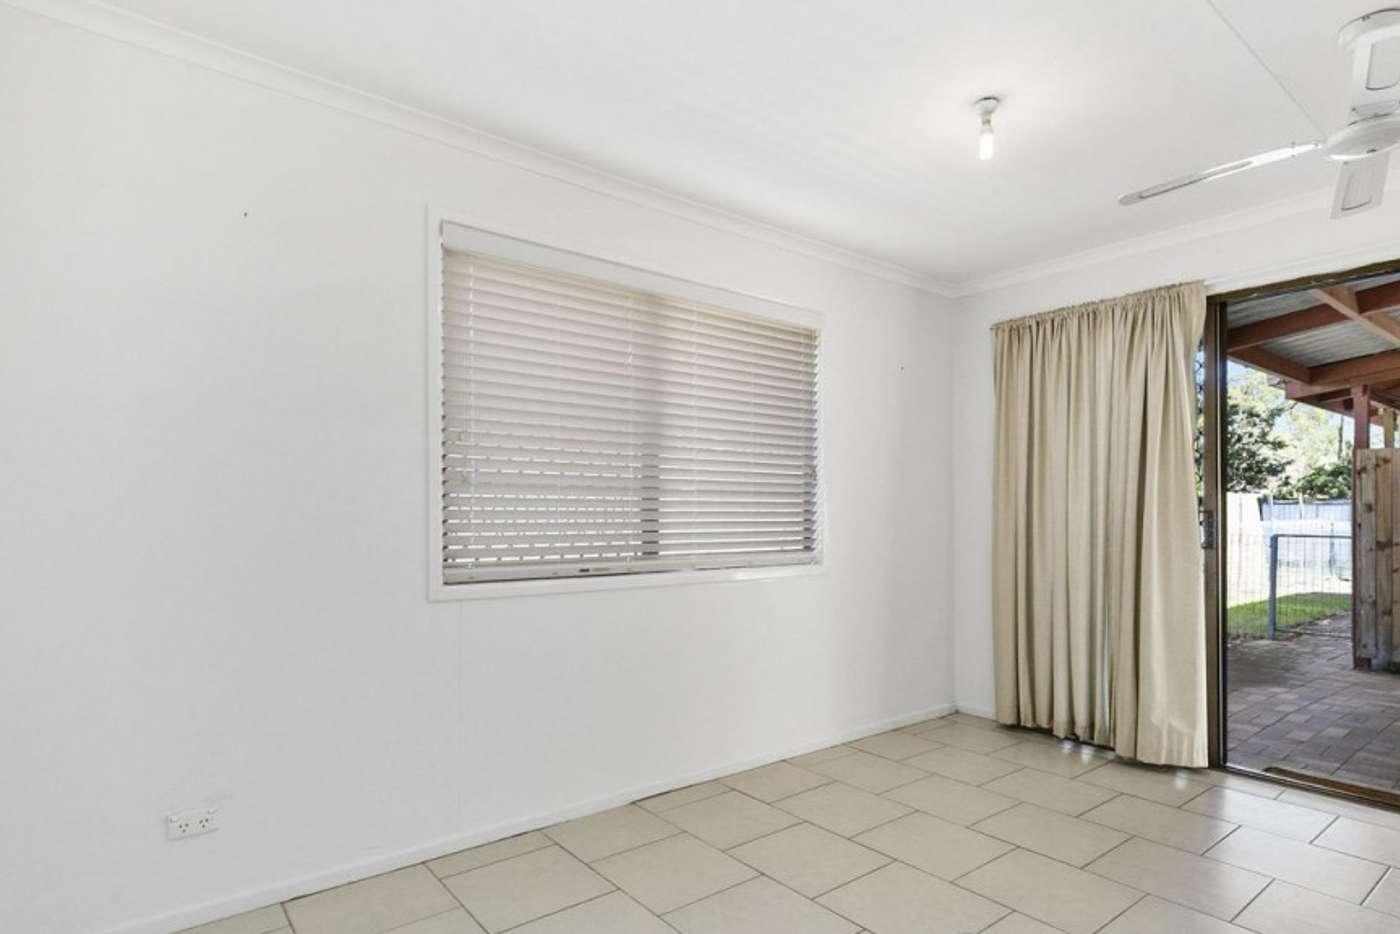 Sixth view of Homely house listing, 144 Mooroondu Road, Thorneside QLD 4158